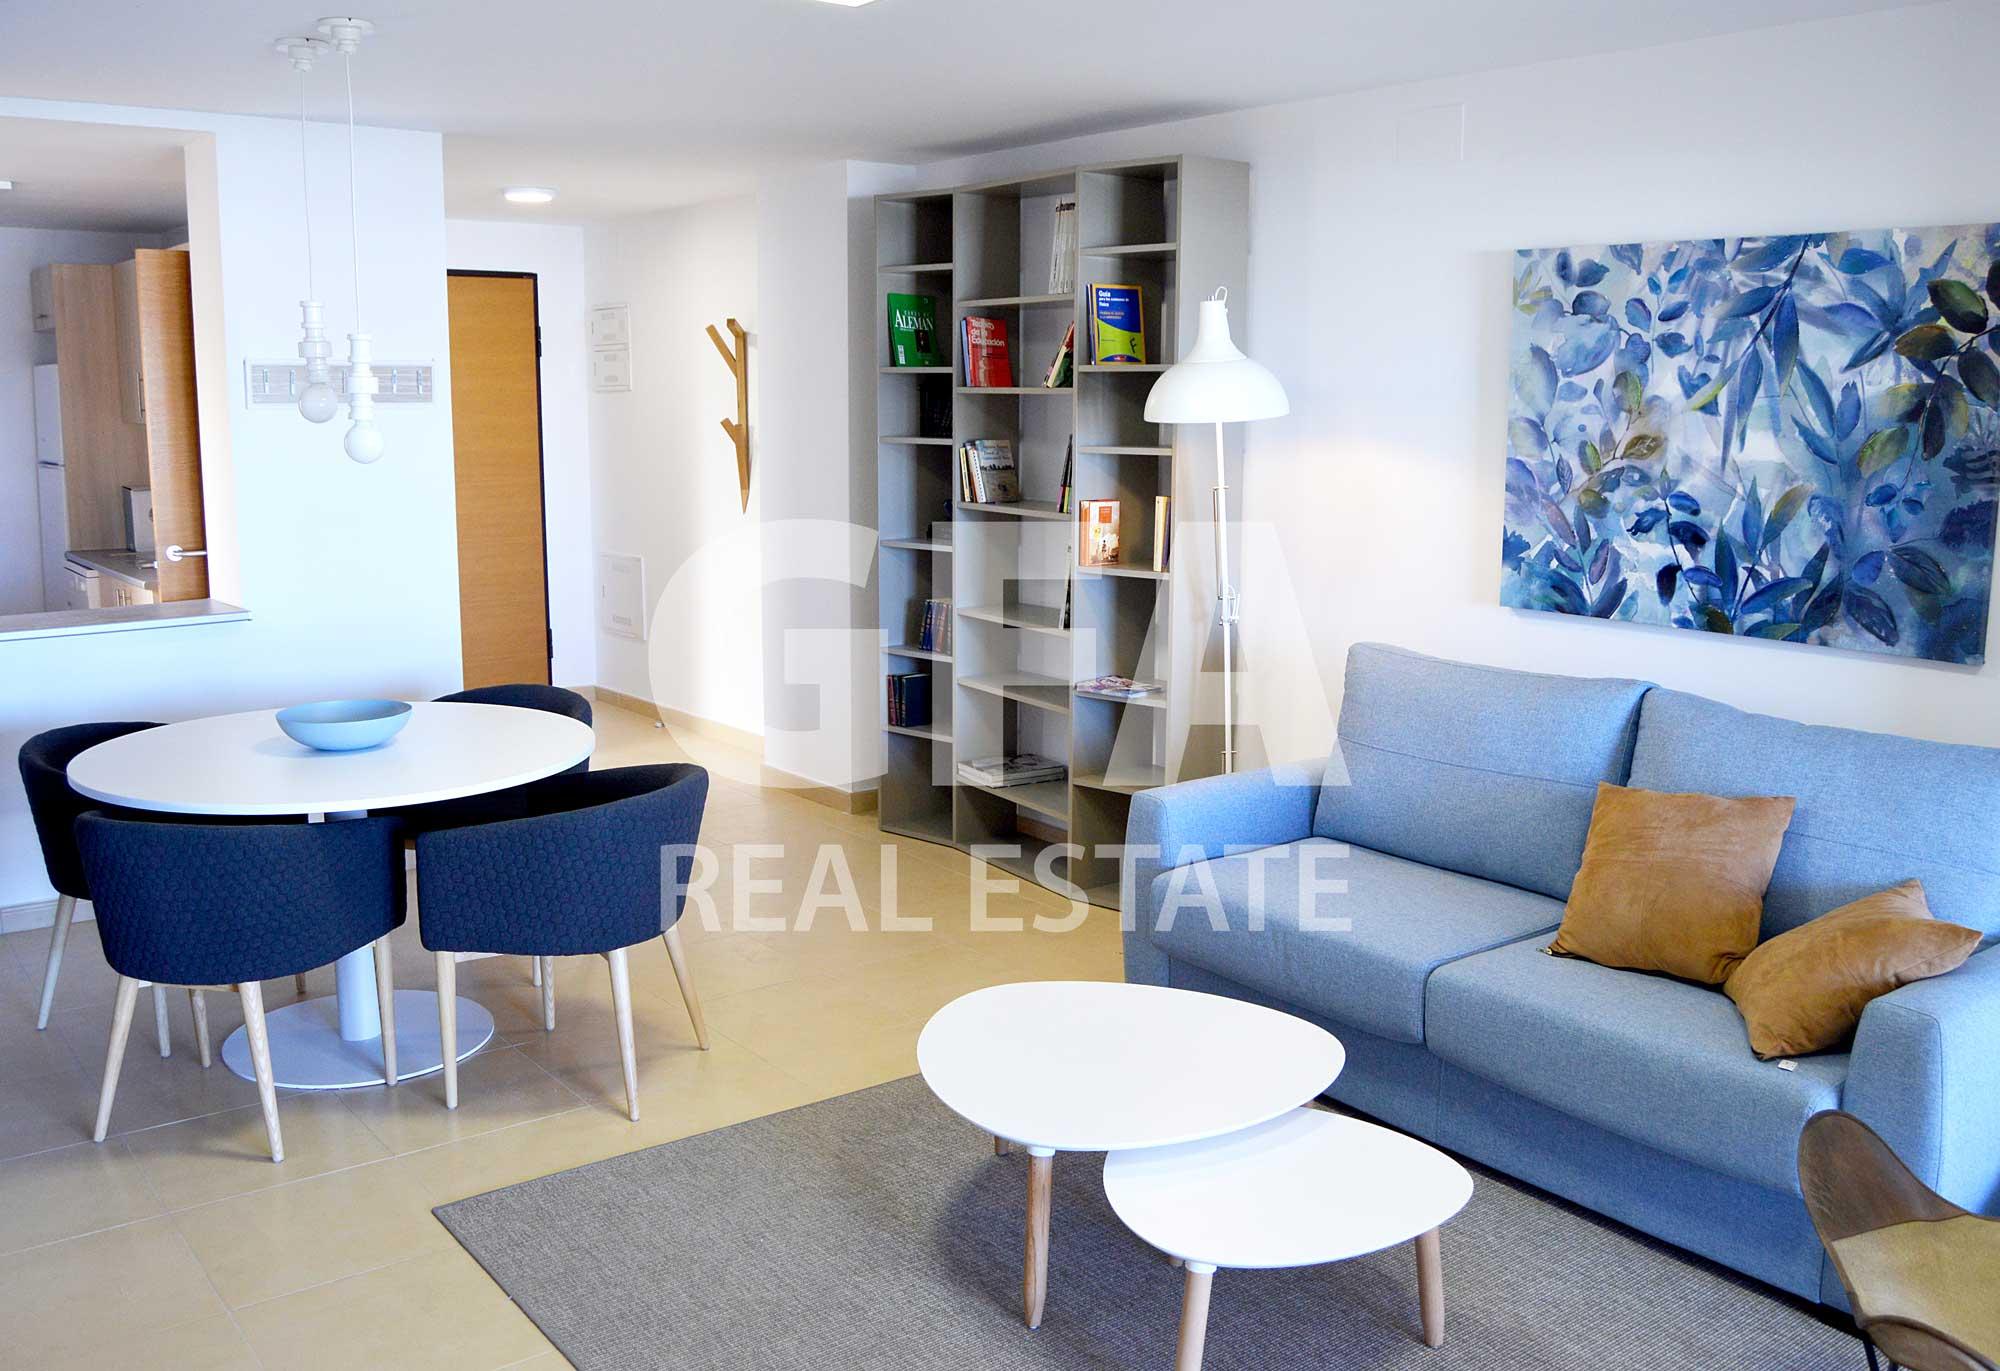 boulevard-viviendas-de-obra-nueva-resort-mar-menor (26)